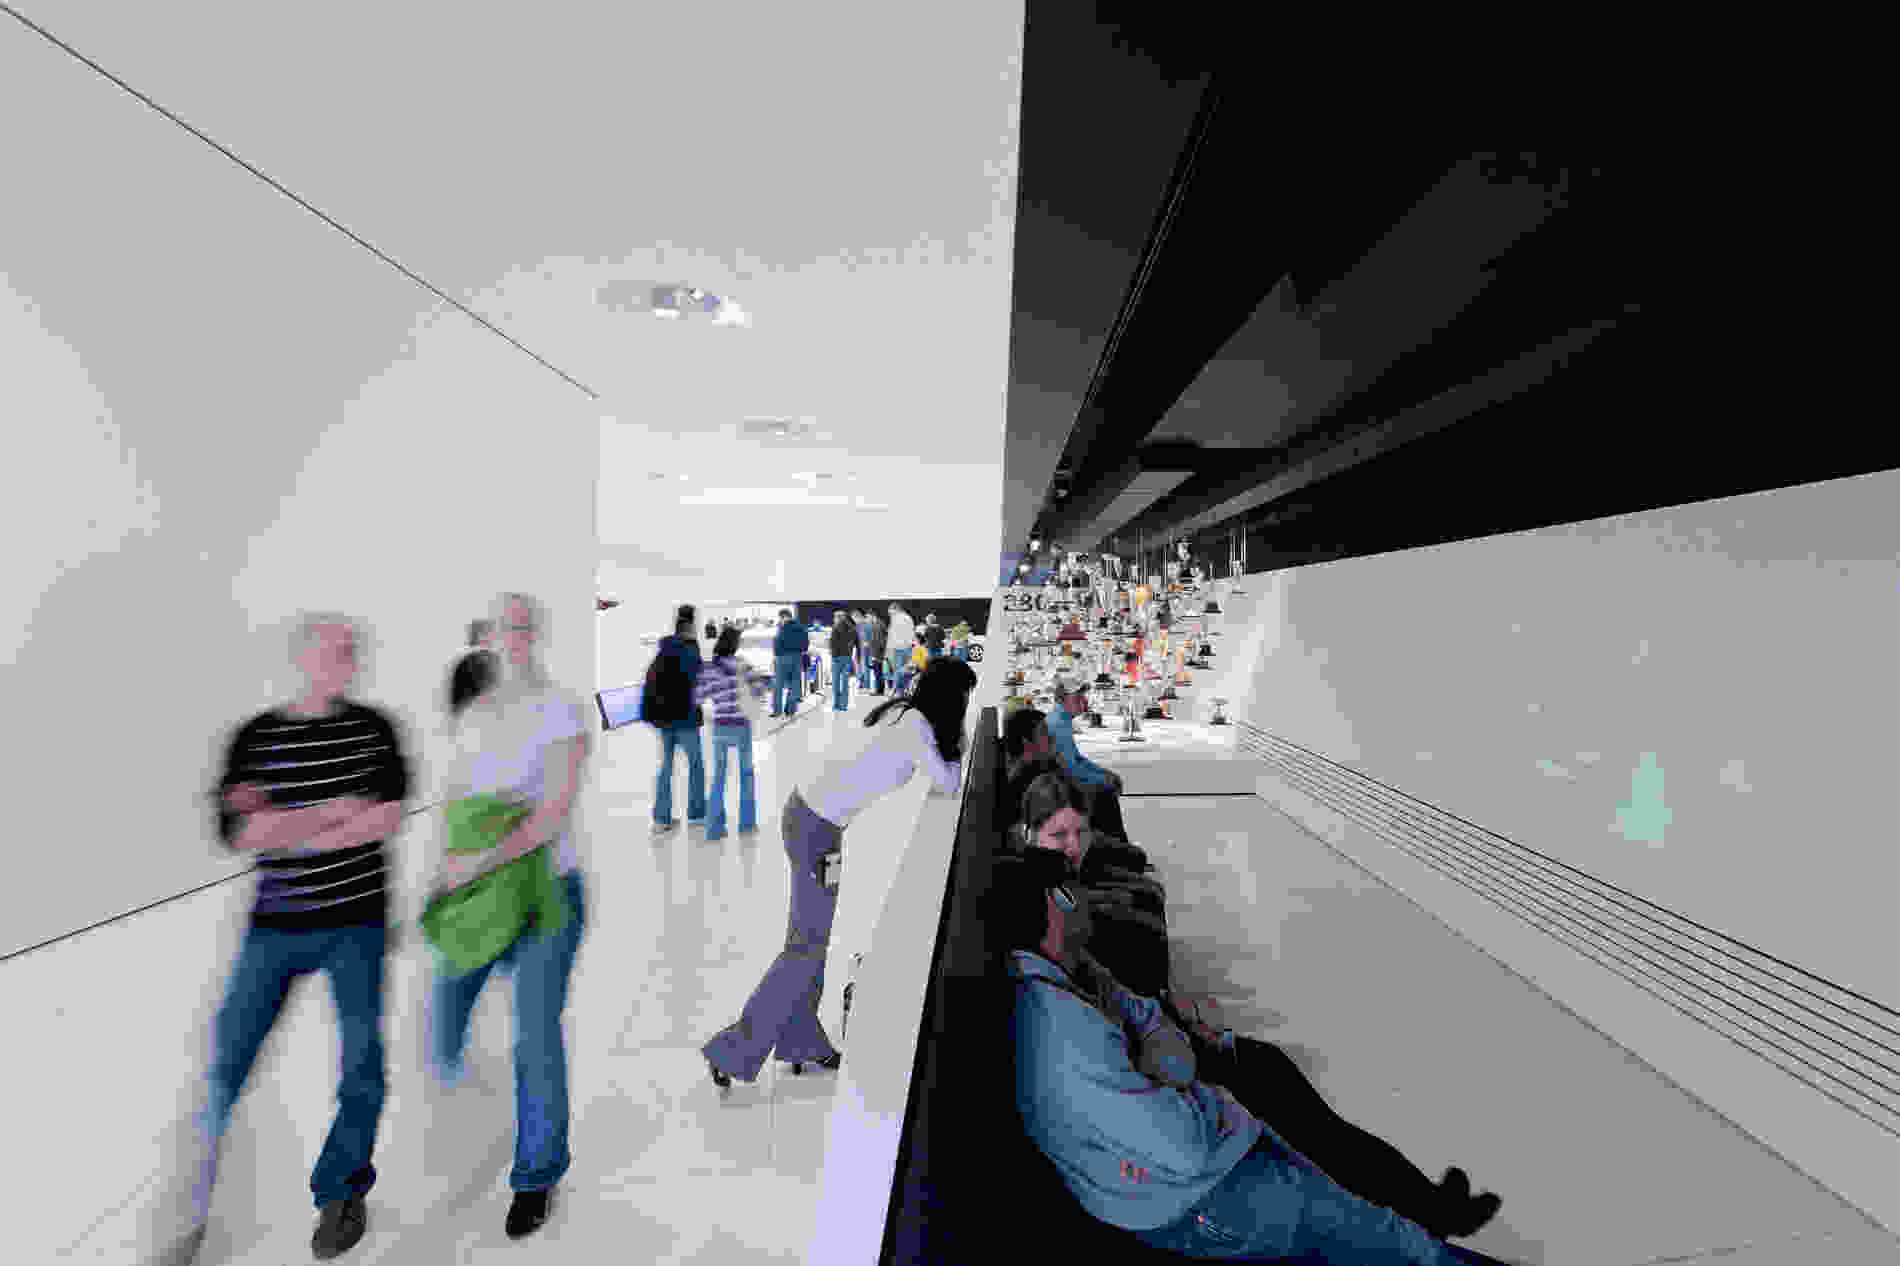 135 Porsche Museum Iwan Baan 011 interior exhibition